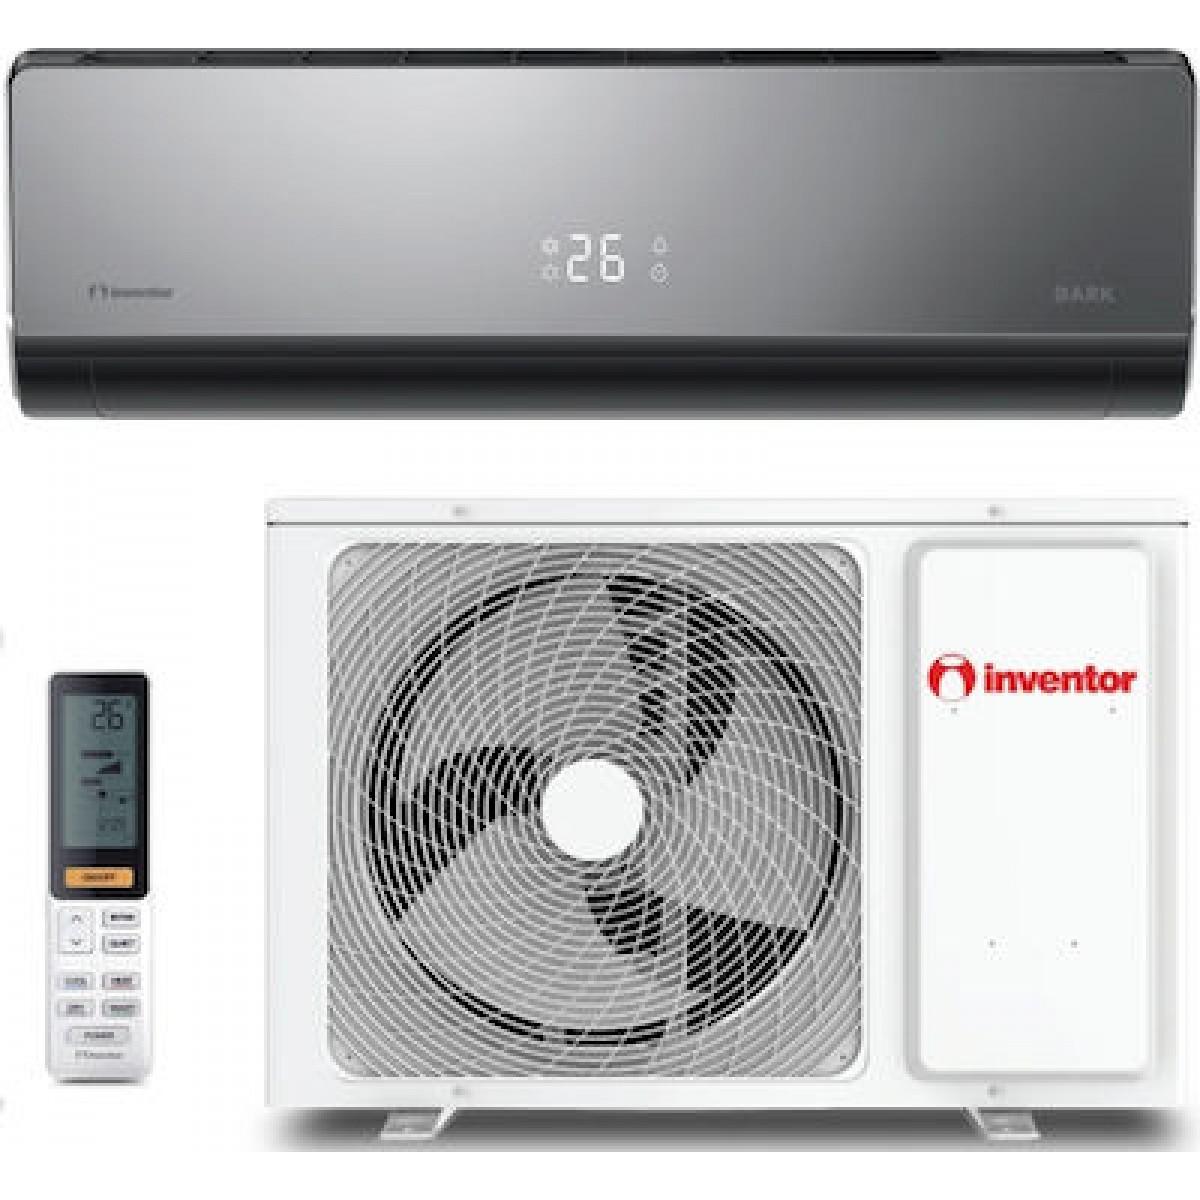 Inventor Dark DRVI32-24WF Θέρμανση, Κλιματισμός Ηλεκτρικες Συσκευες - homeelectrics.gr